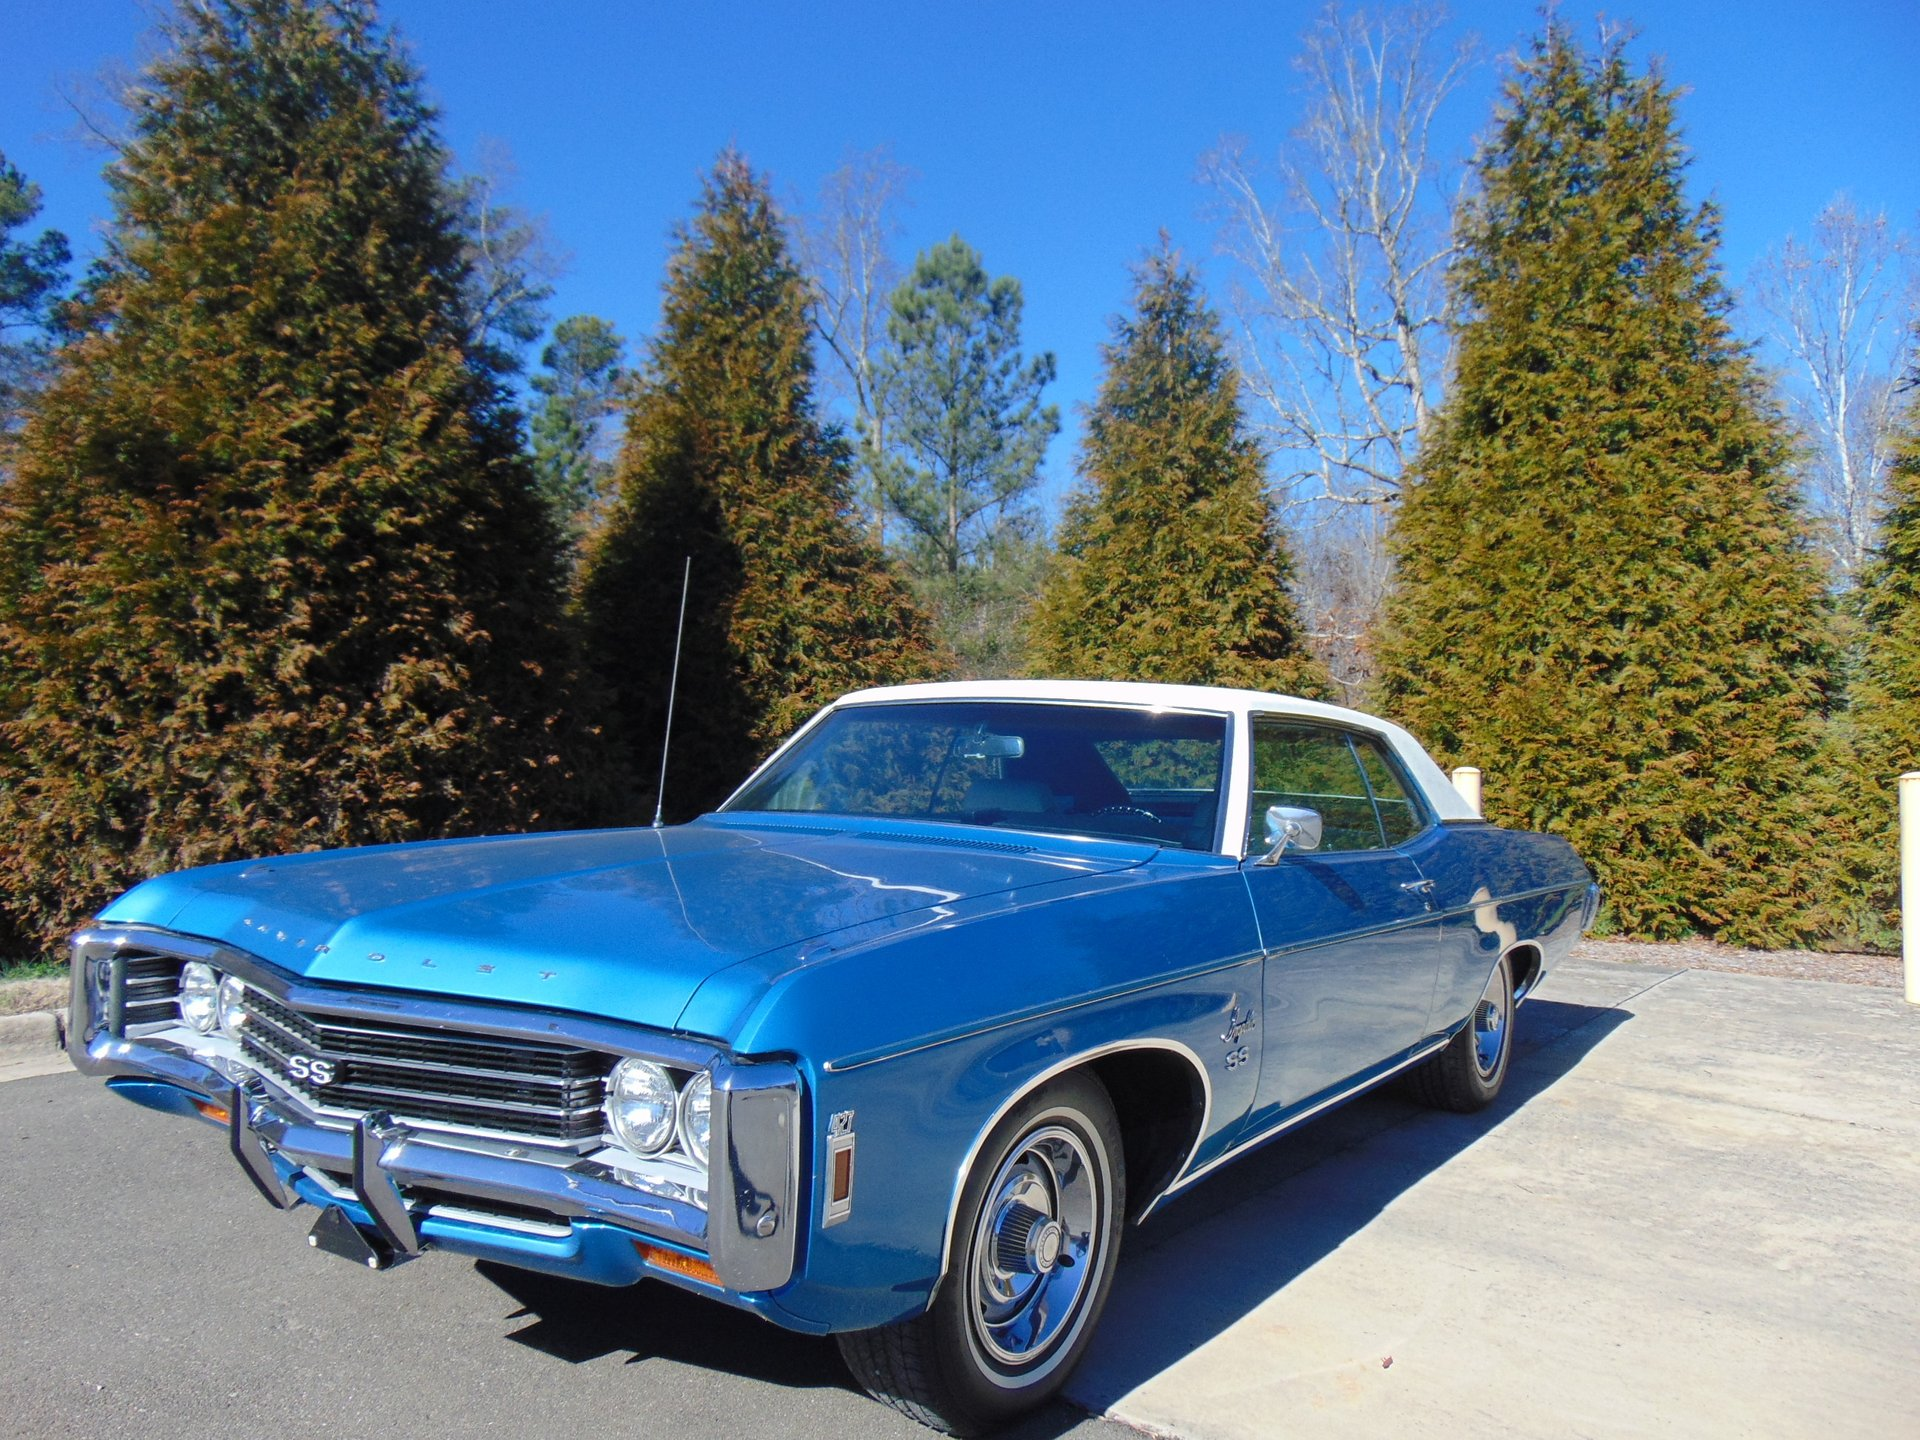 1969 chevrolet impala ss 427